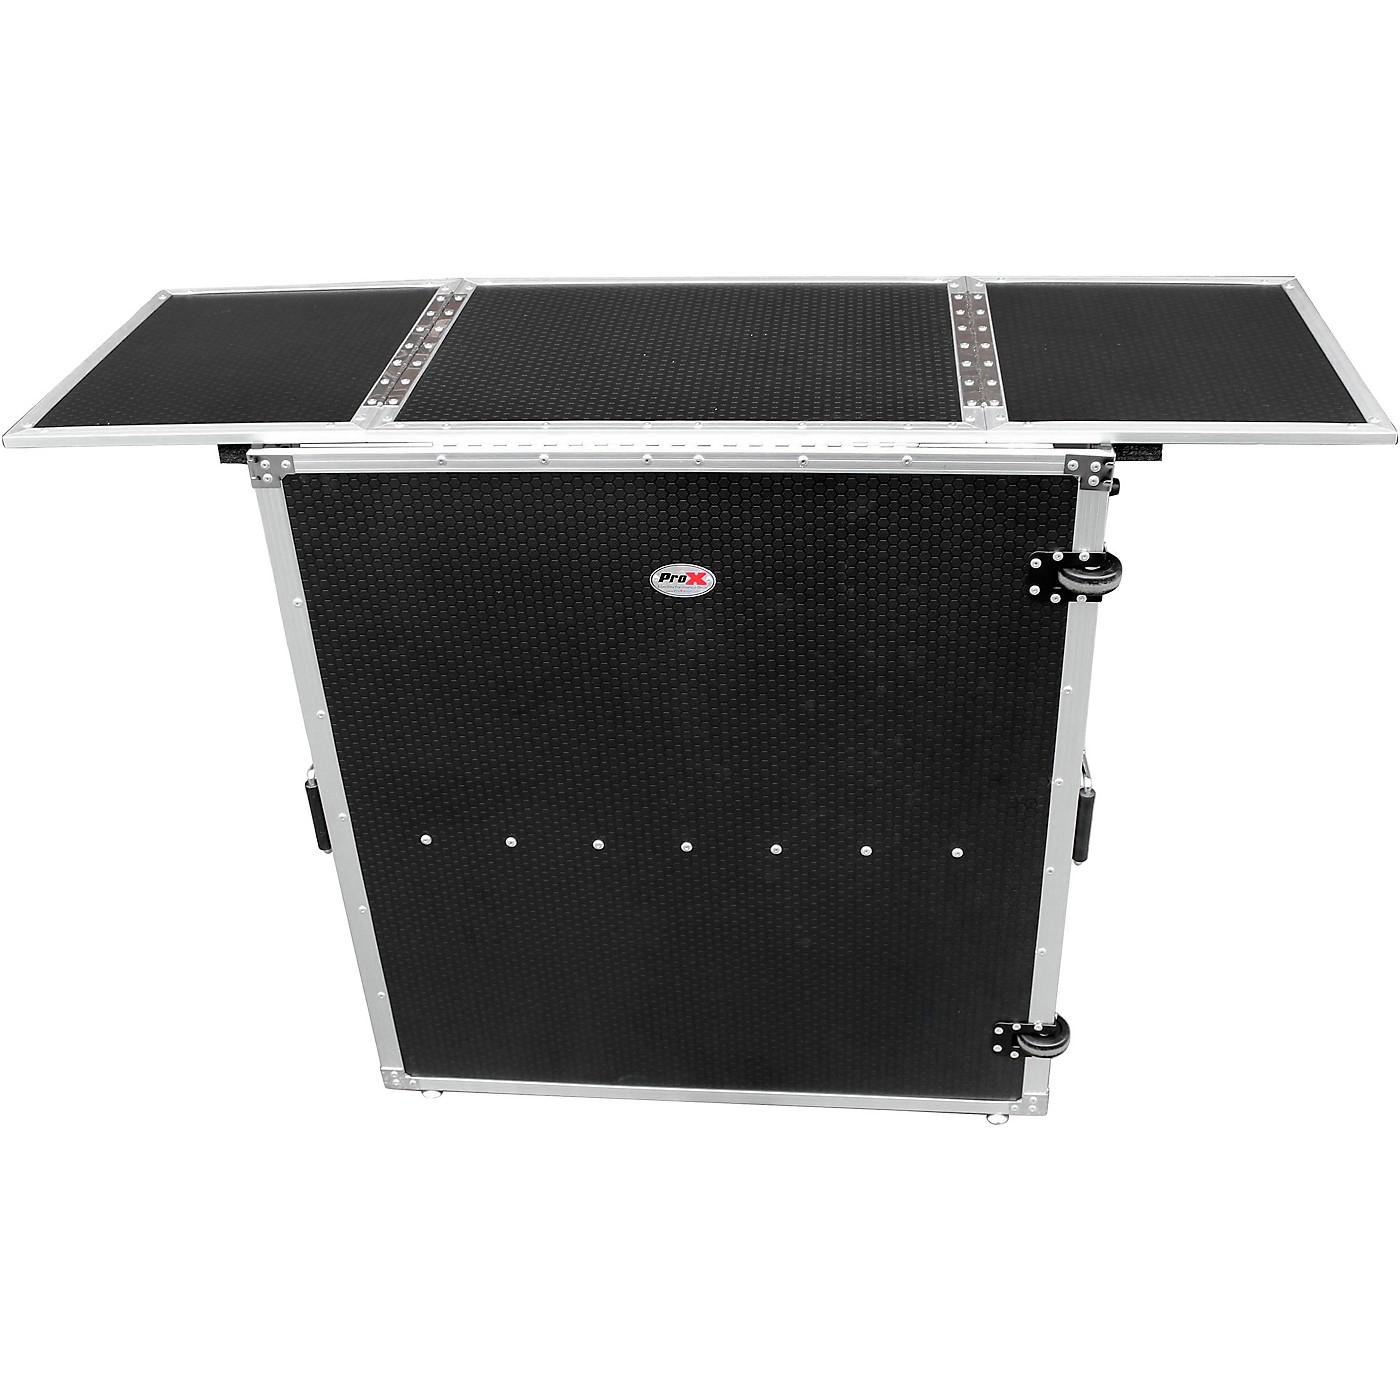 ProX Transformer Series Fold Away DJ Performance Desk Facade Black/Black with Wheels thumbnail